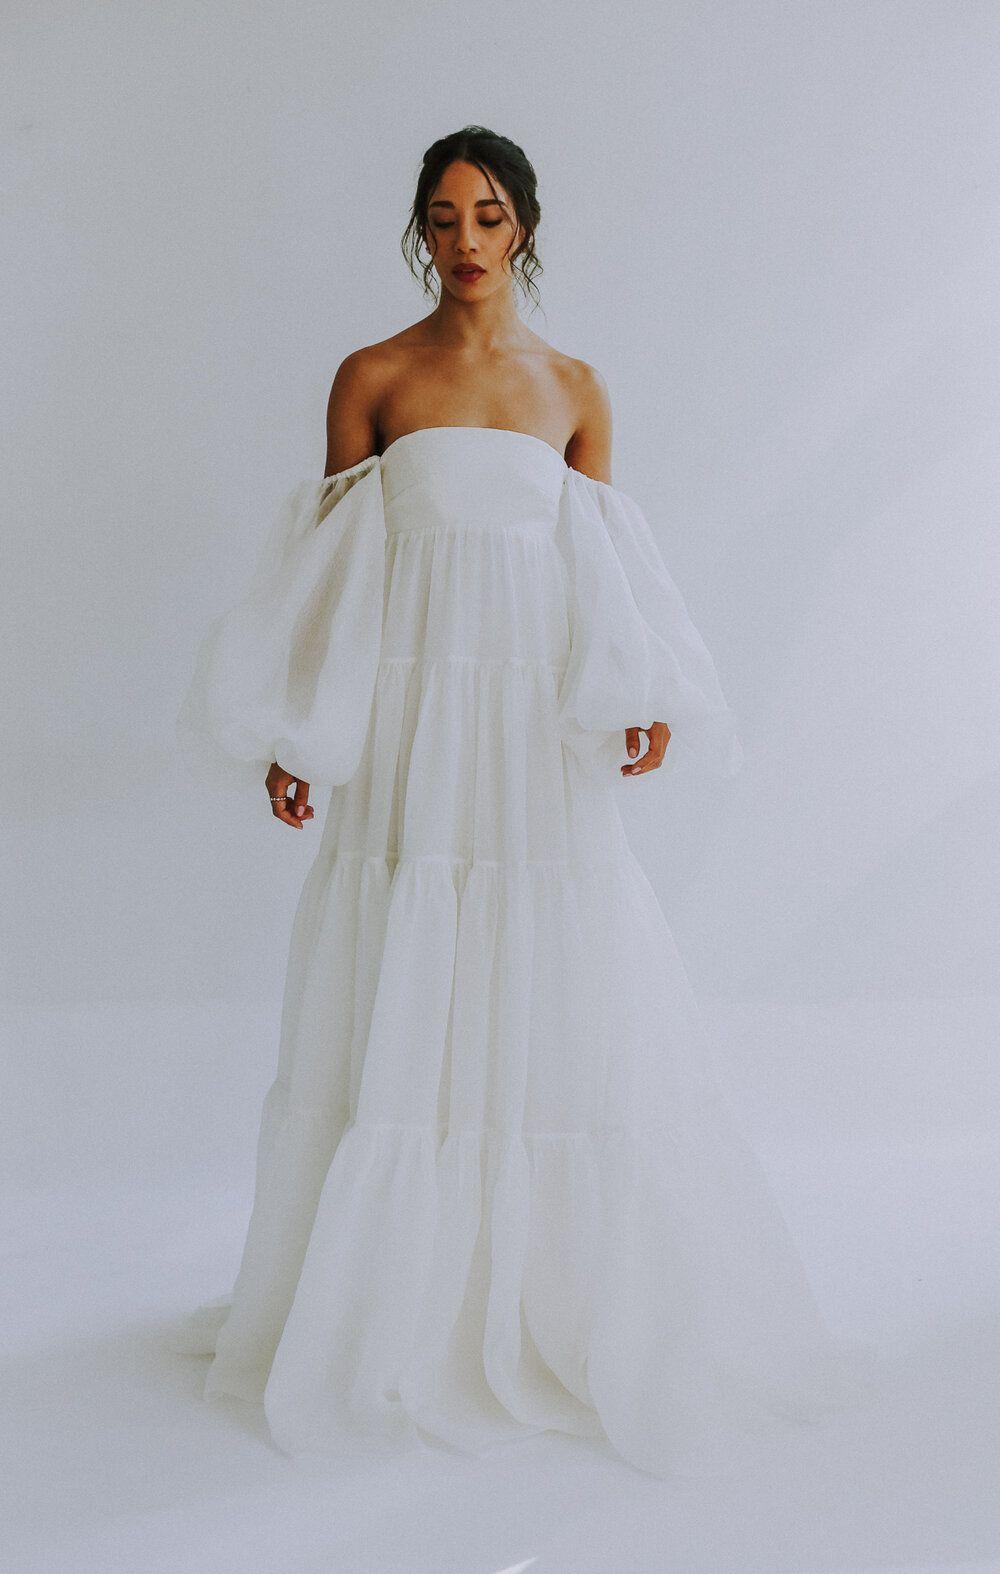 BHLDN Tallulah, $1,750 Size: 4 | New (Un-Altered) Wedding ... |Tallulah Wedding Dress